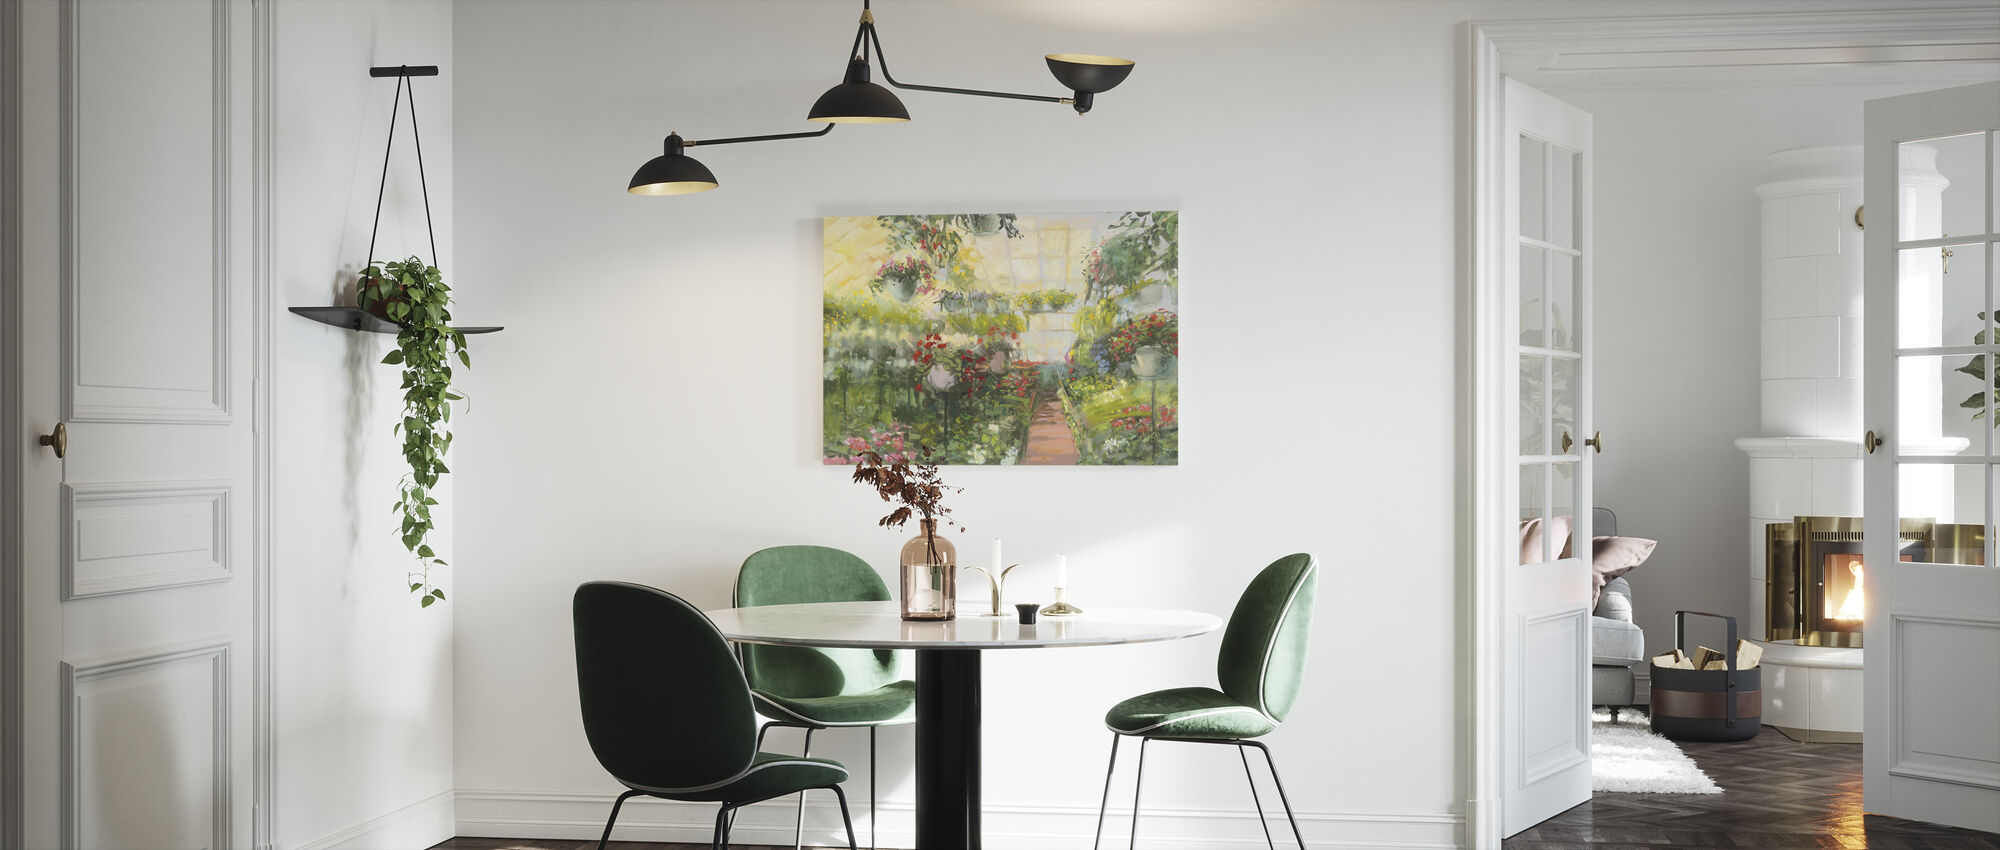 Kas Bloemen - Canvas print - Keuken